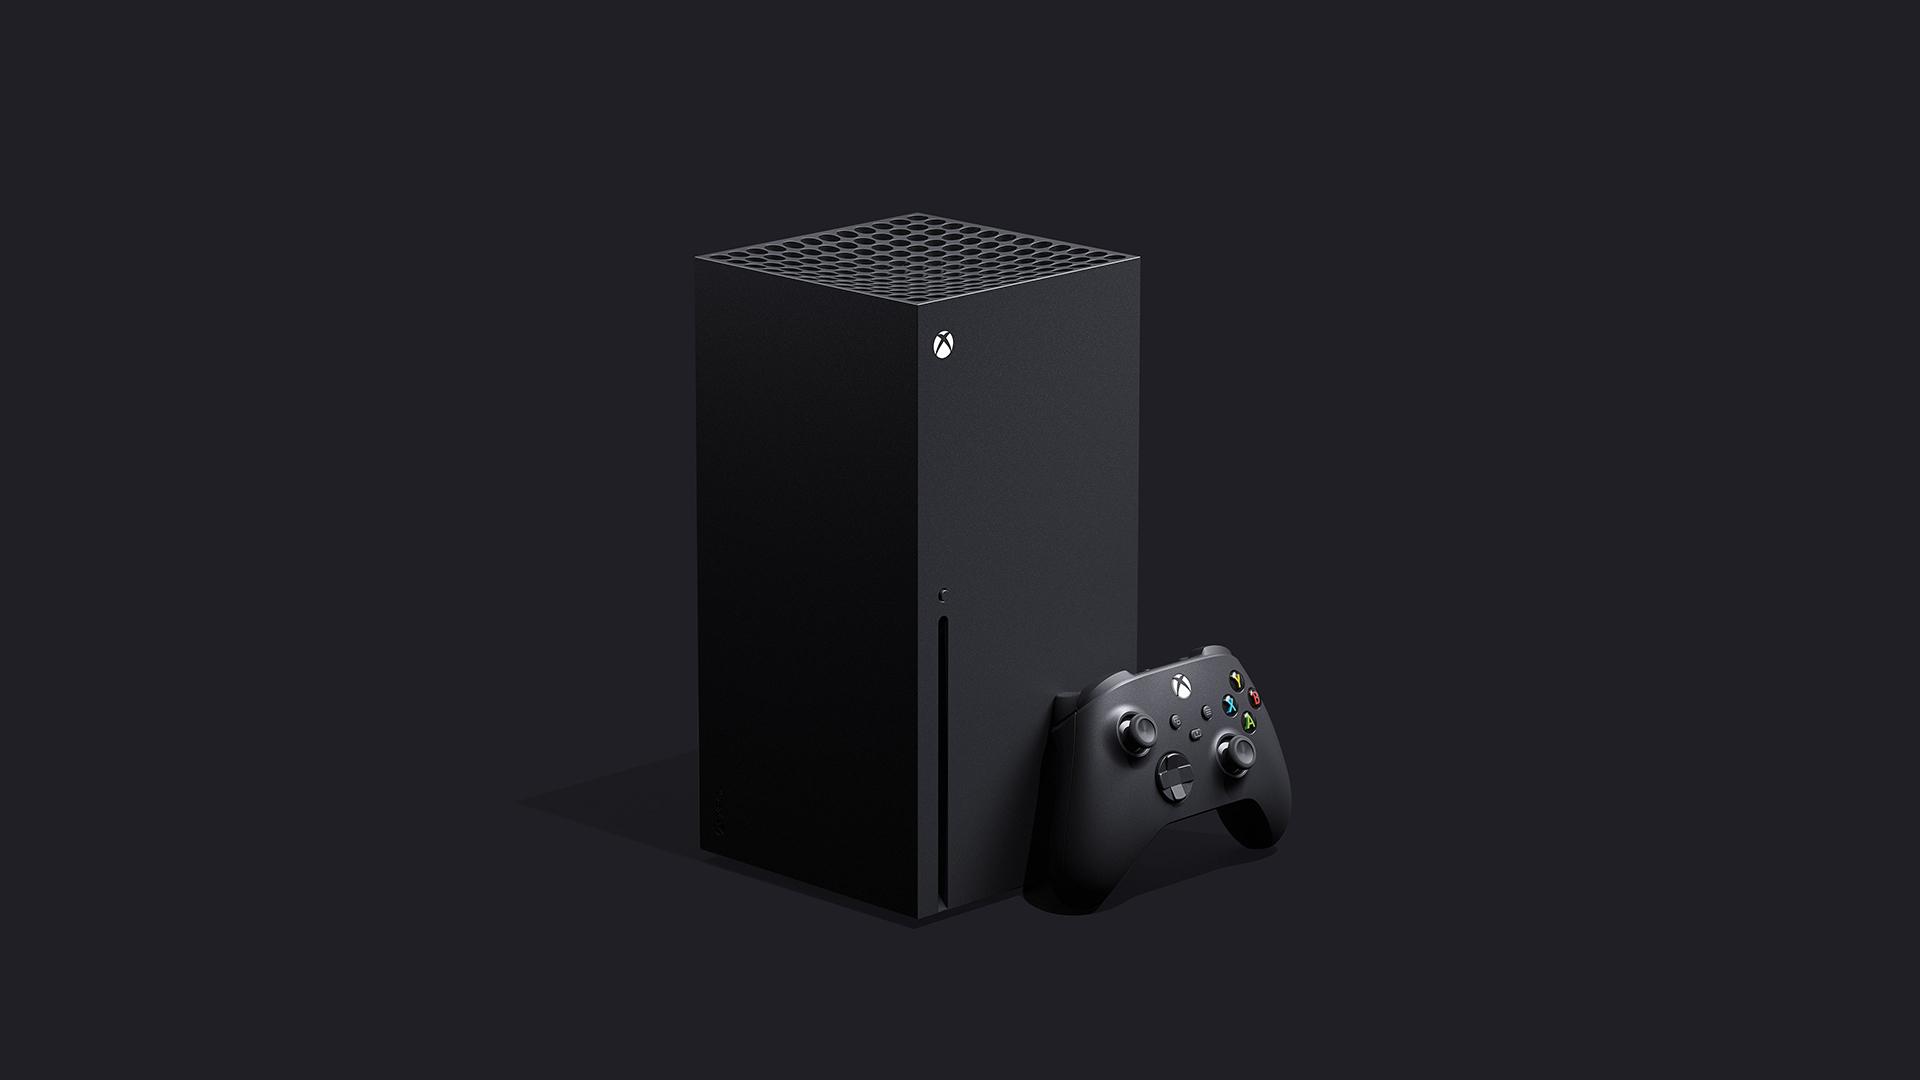 https://www.coolaler.com.tw/image/news/20/08/XboxSeriesX.jpg